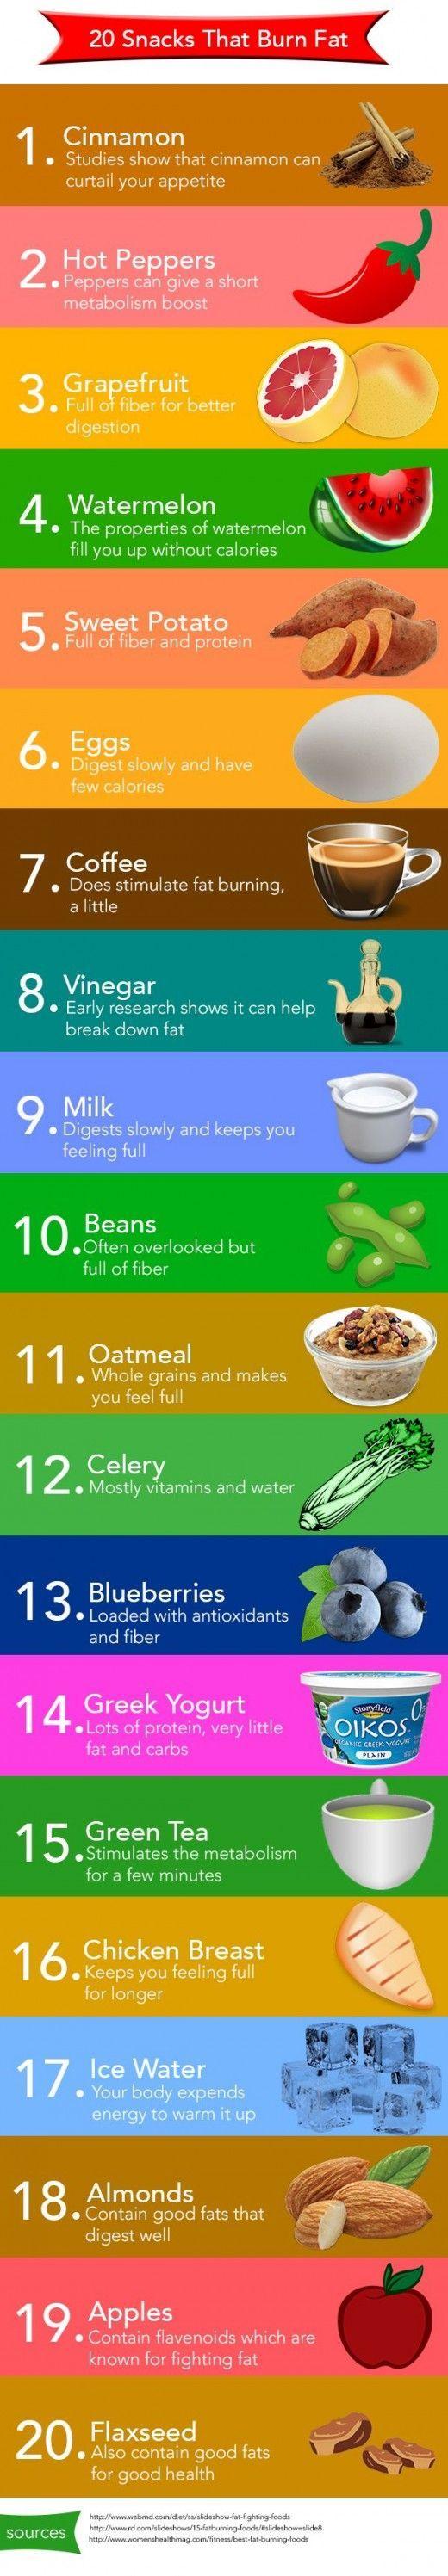 28 day detox tea diet plan